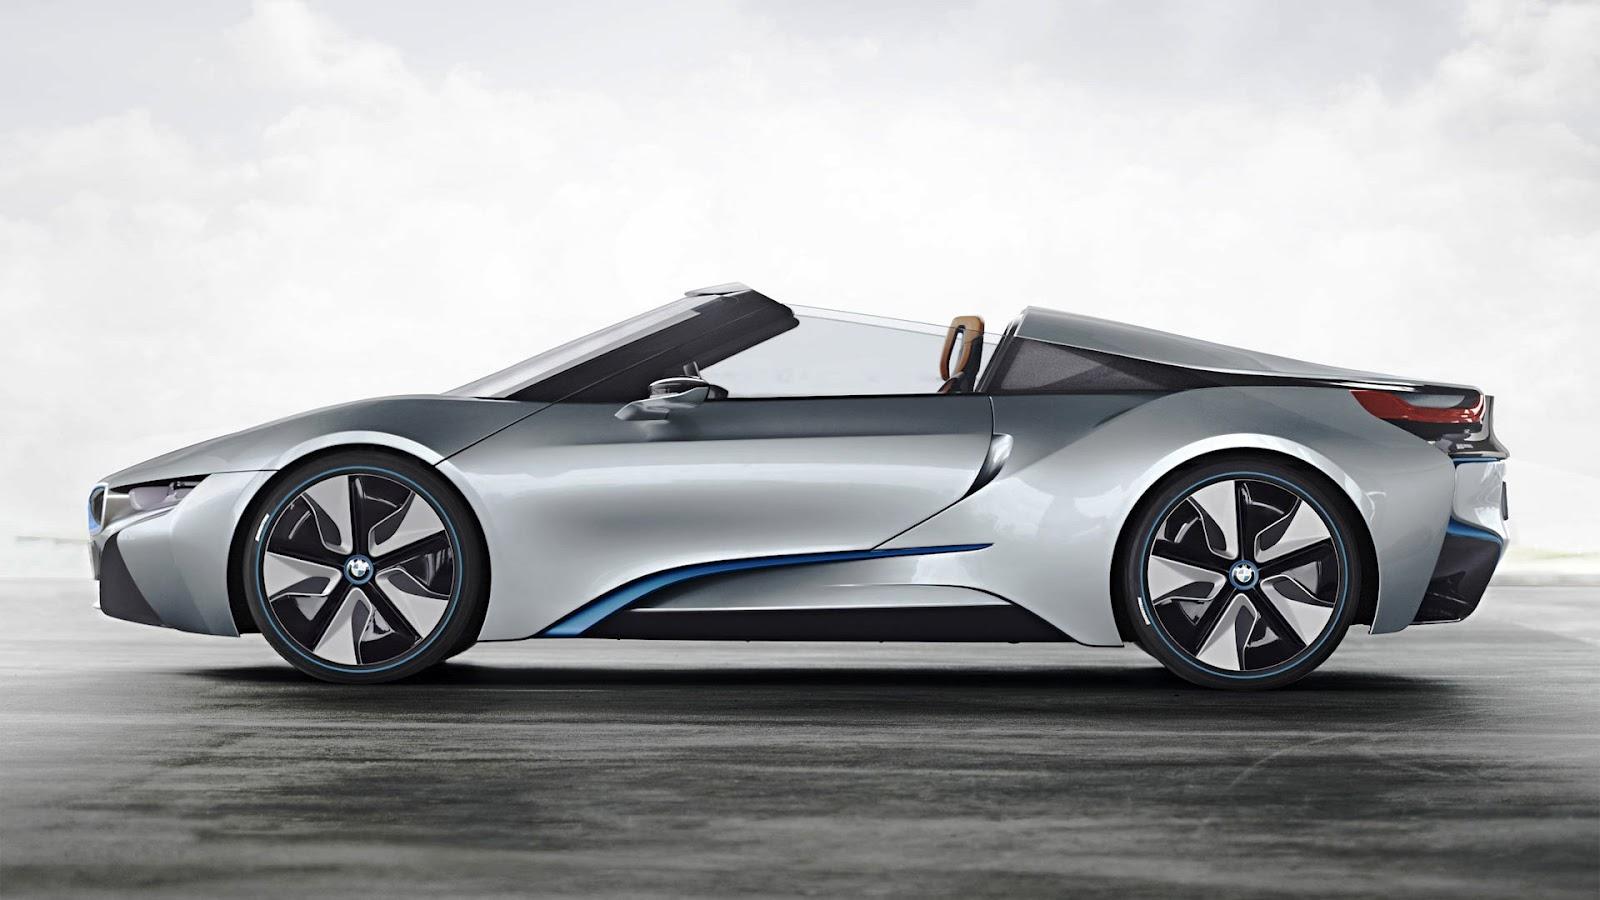 http://4.bp.blogspot.com/--G489IlpVAk/T9FtvPVbBsI/AAAAAAAABNY/KcBPw0c98MQ/s1600/BMW+i8+Spyder+Concept+15.jpg